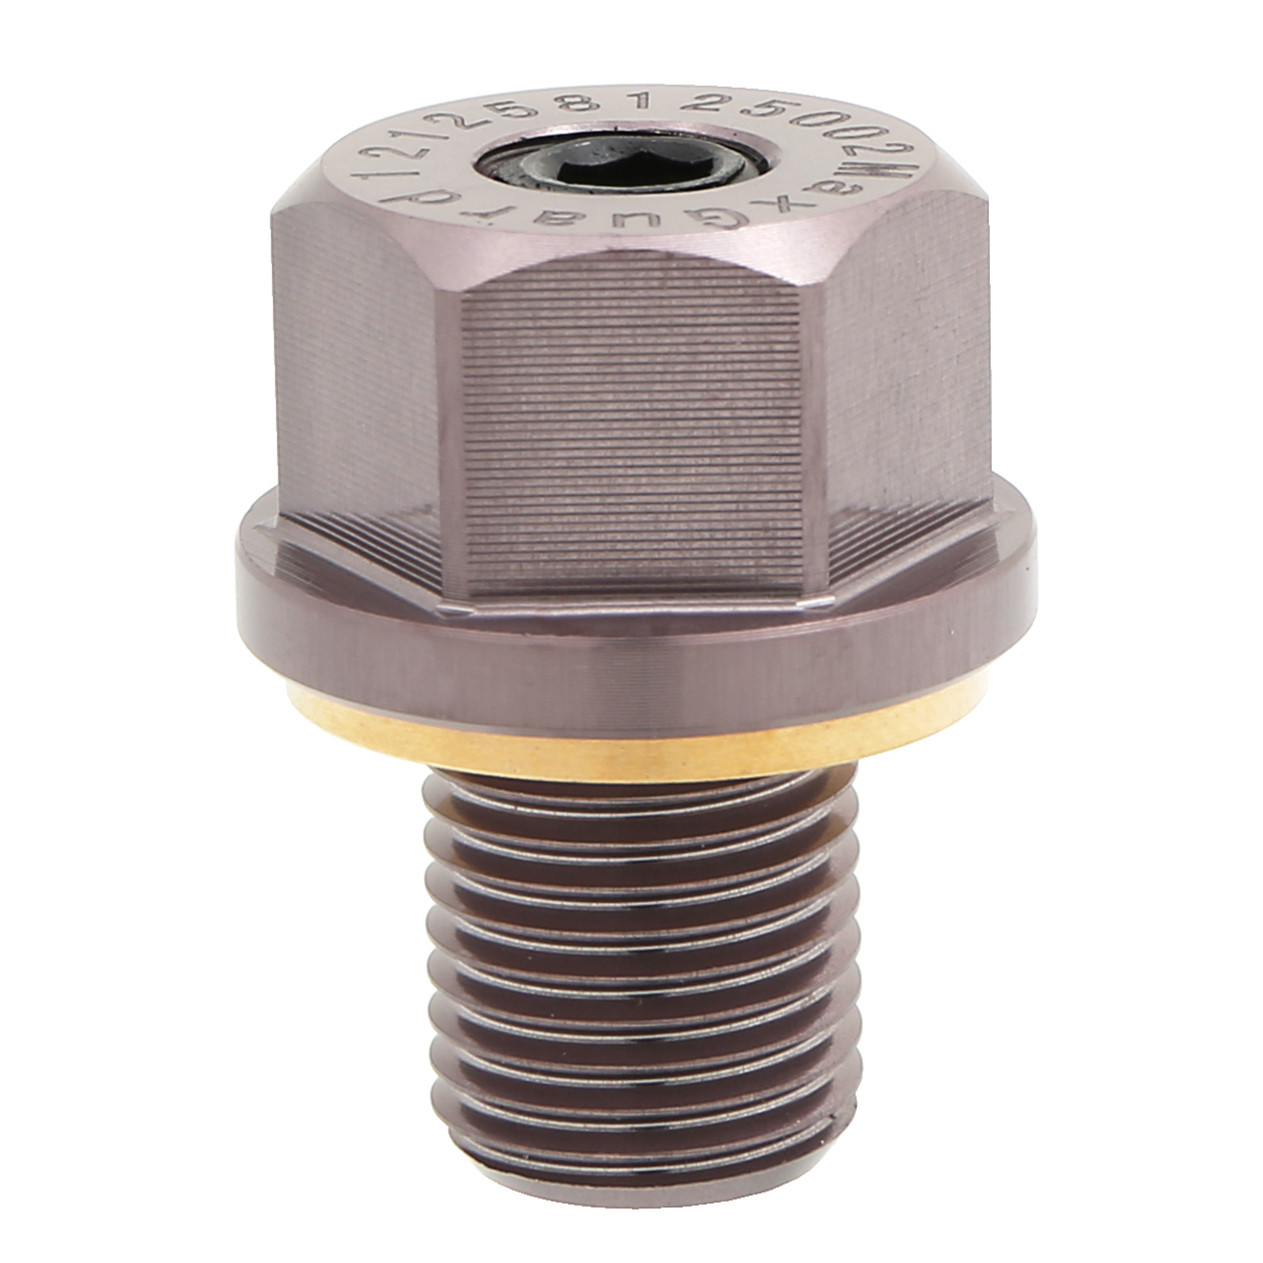 METZGER Oil Pan Screw Plug Steel For TOYOTA LEXUS DAIHATSU SCION 90341-12012